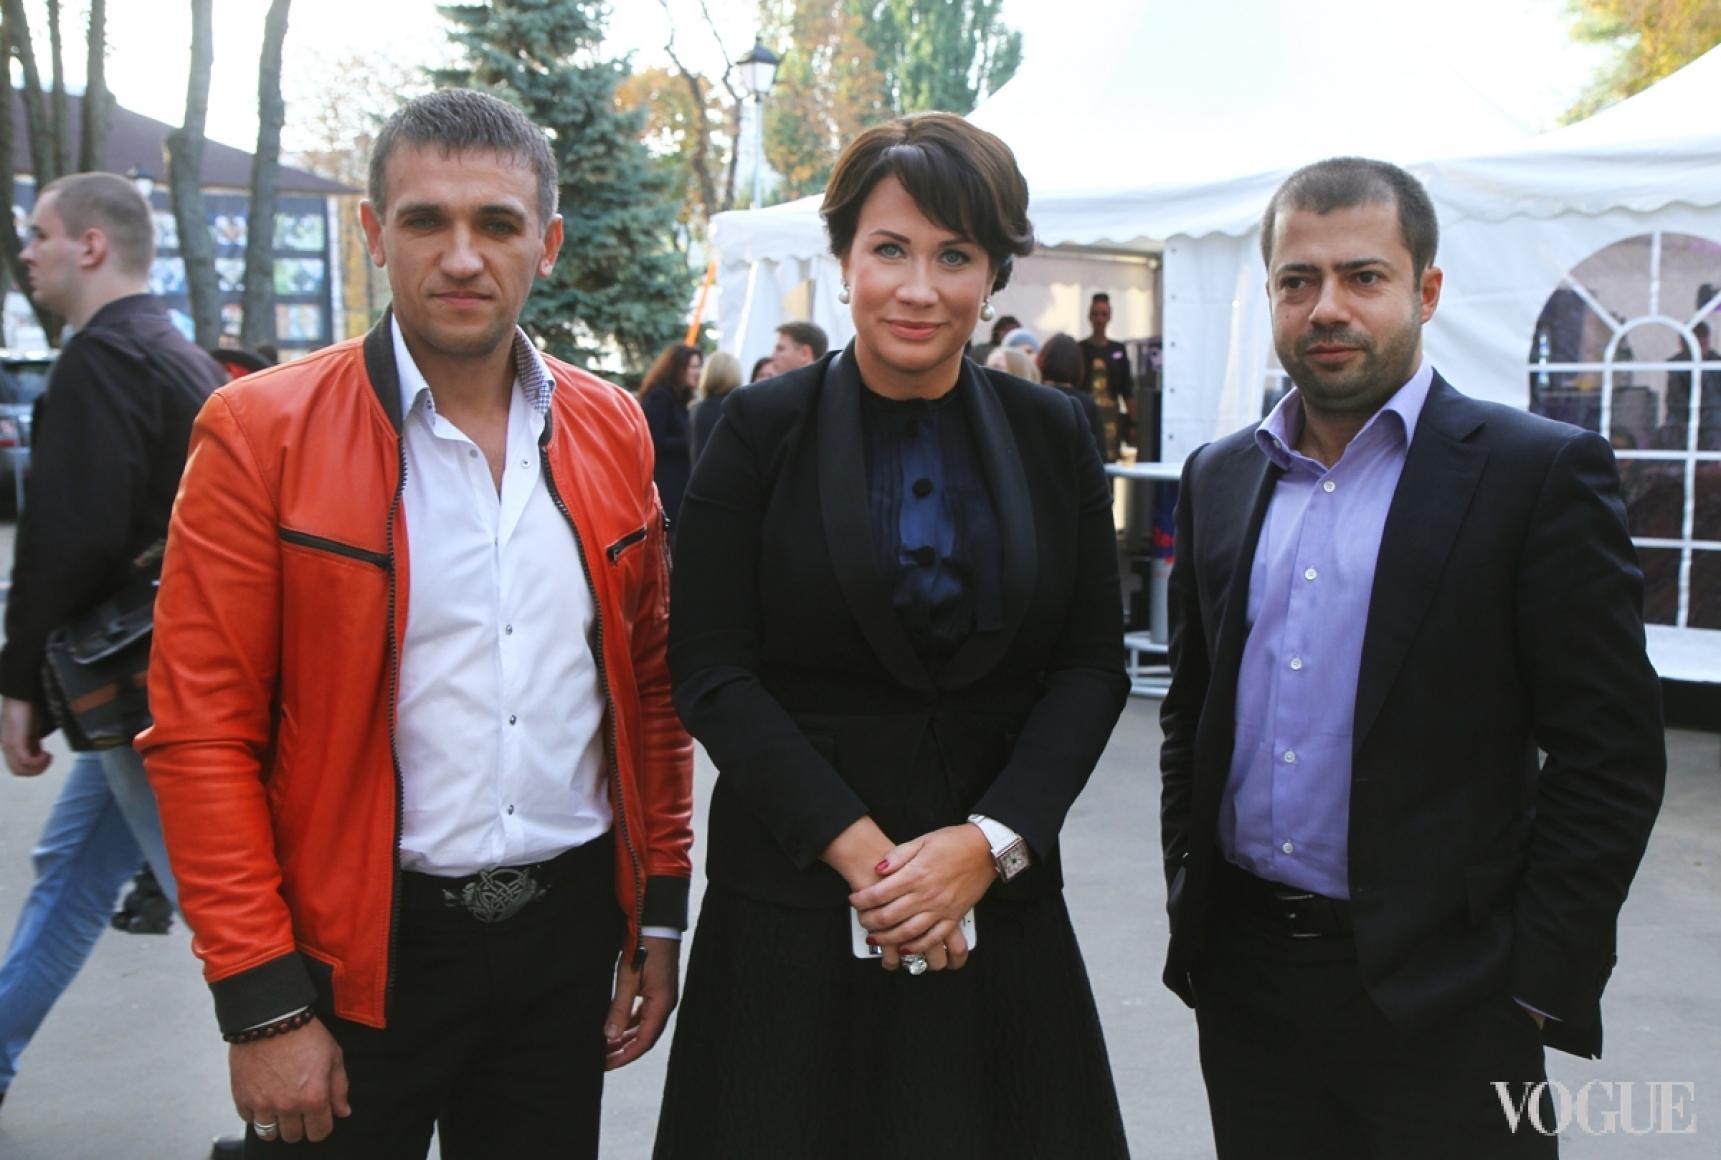 Игорь Абрамович, Влада Фирташ, Александр Черницкий